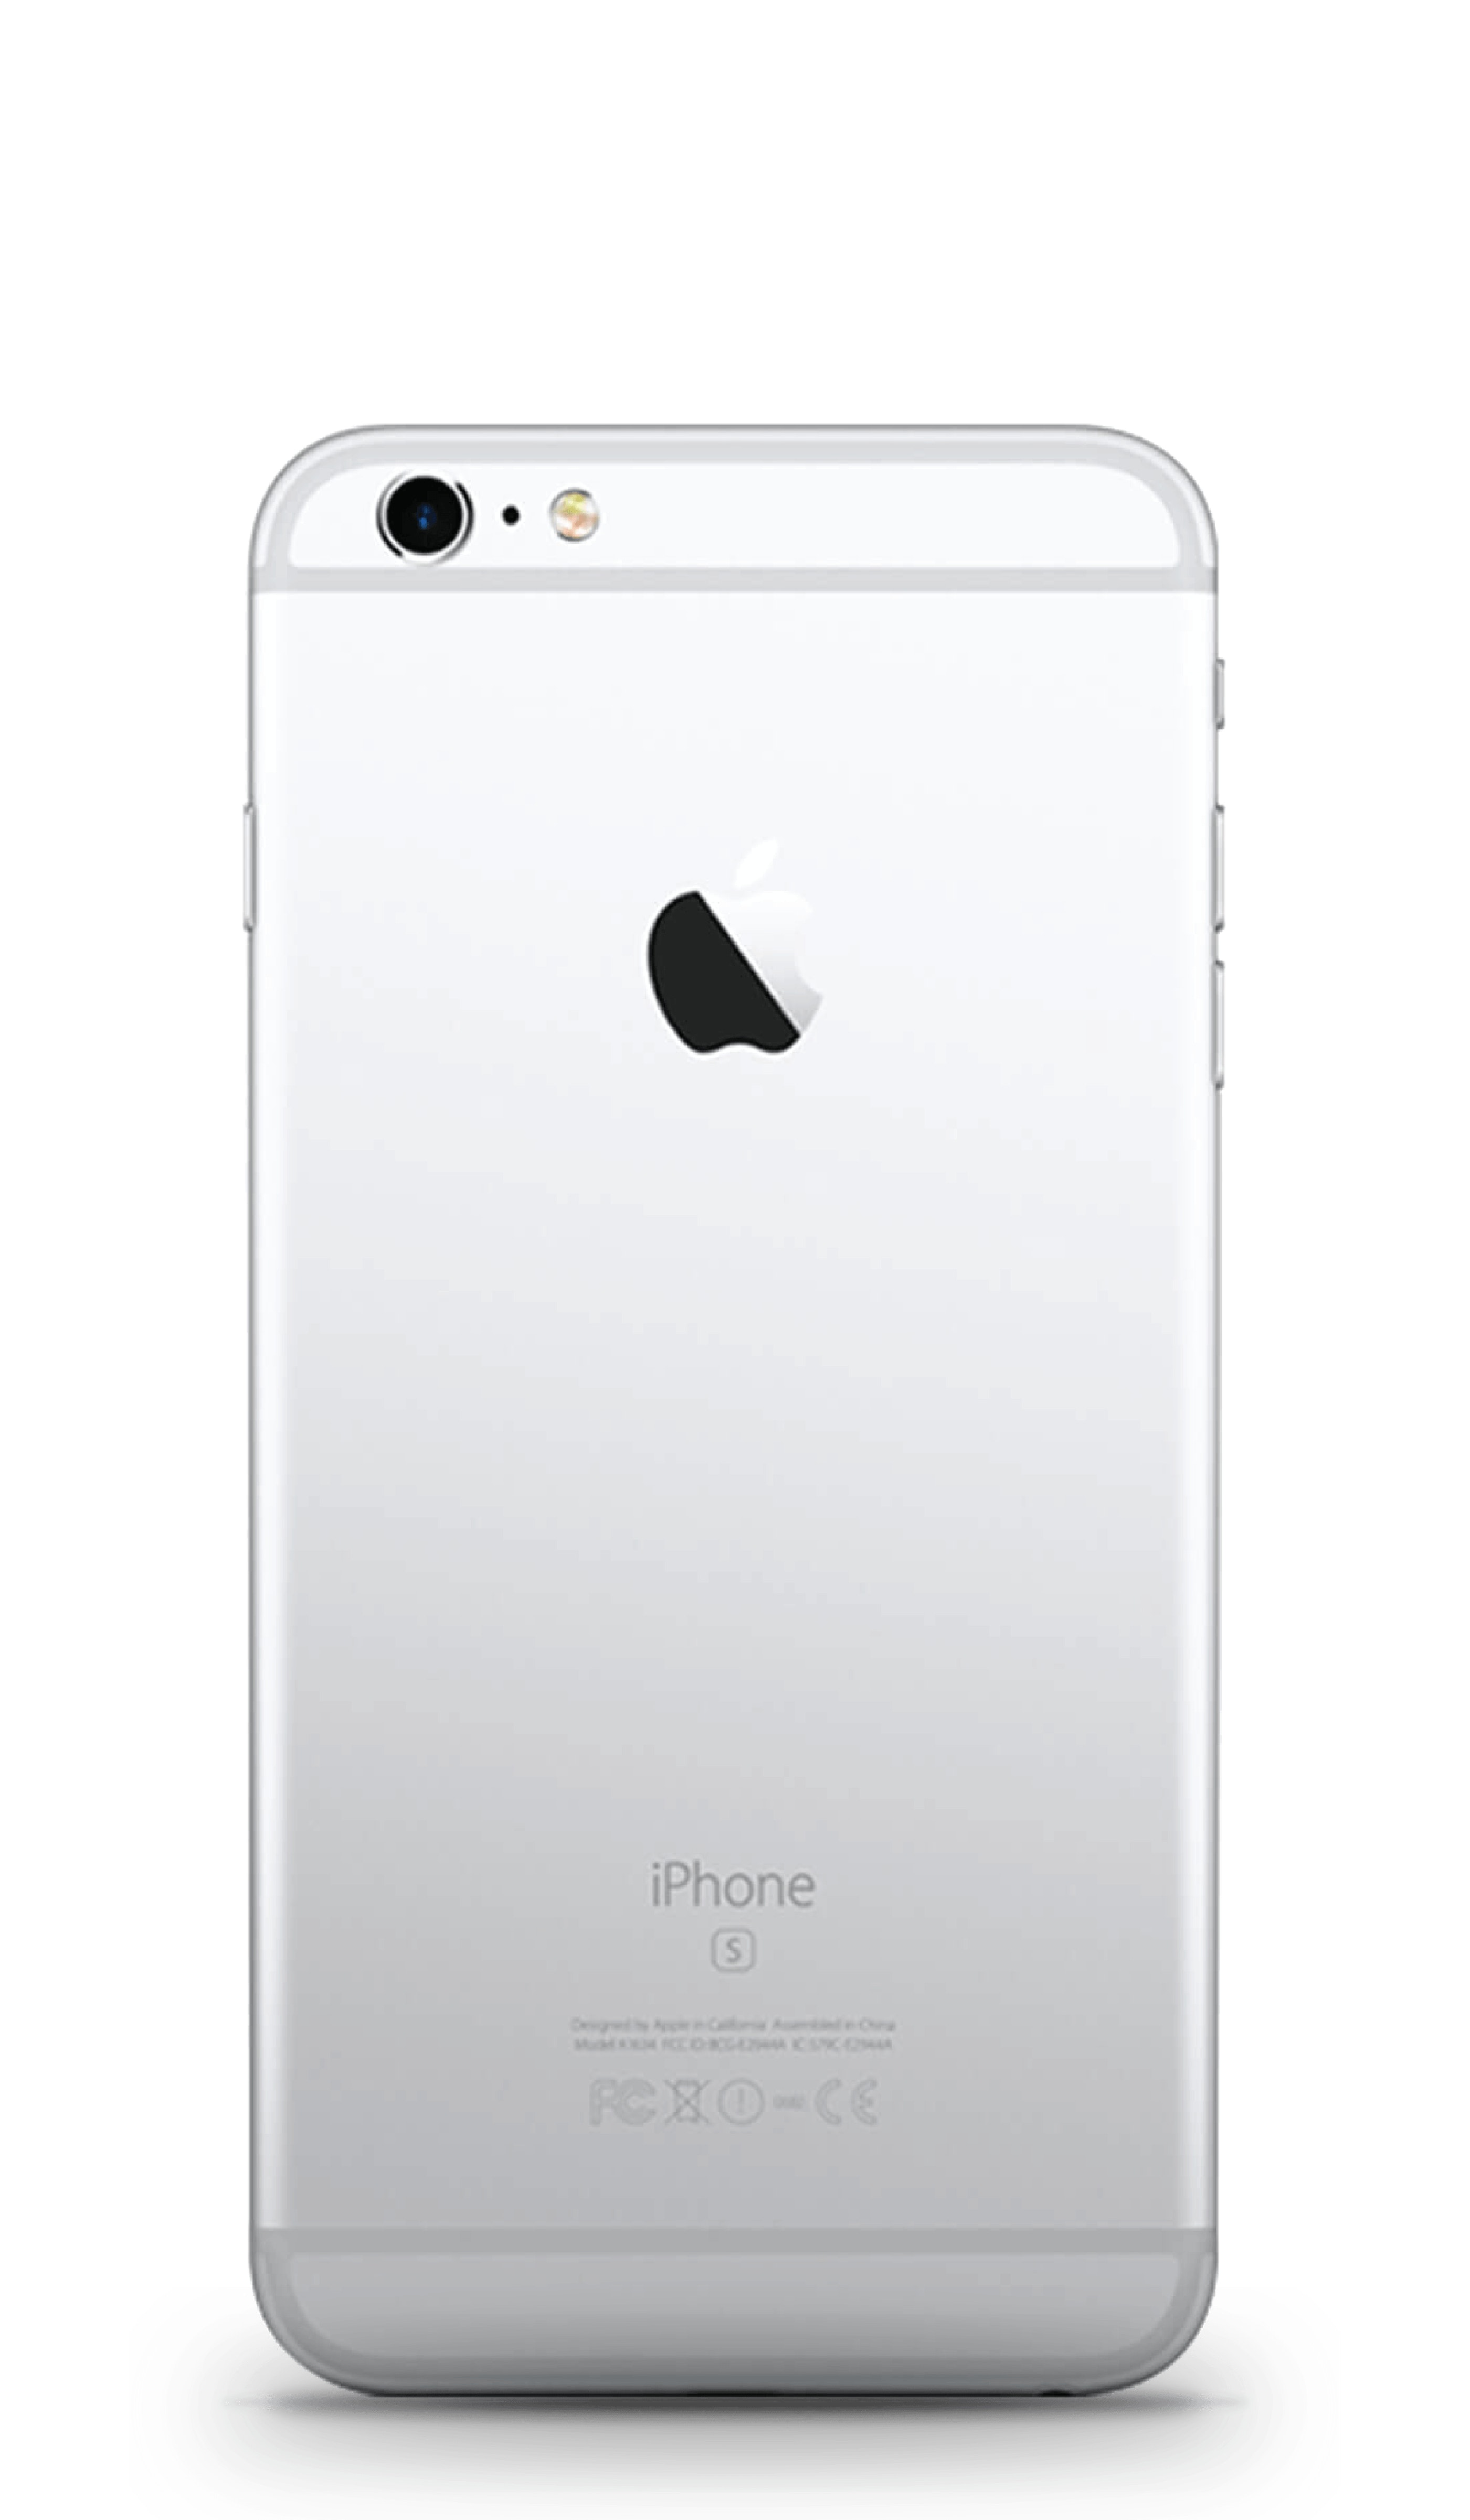 Apple iPhone 6s image